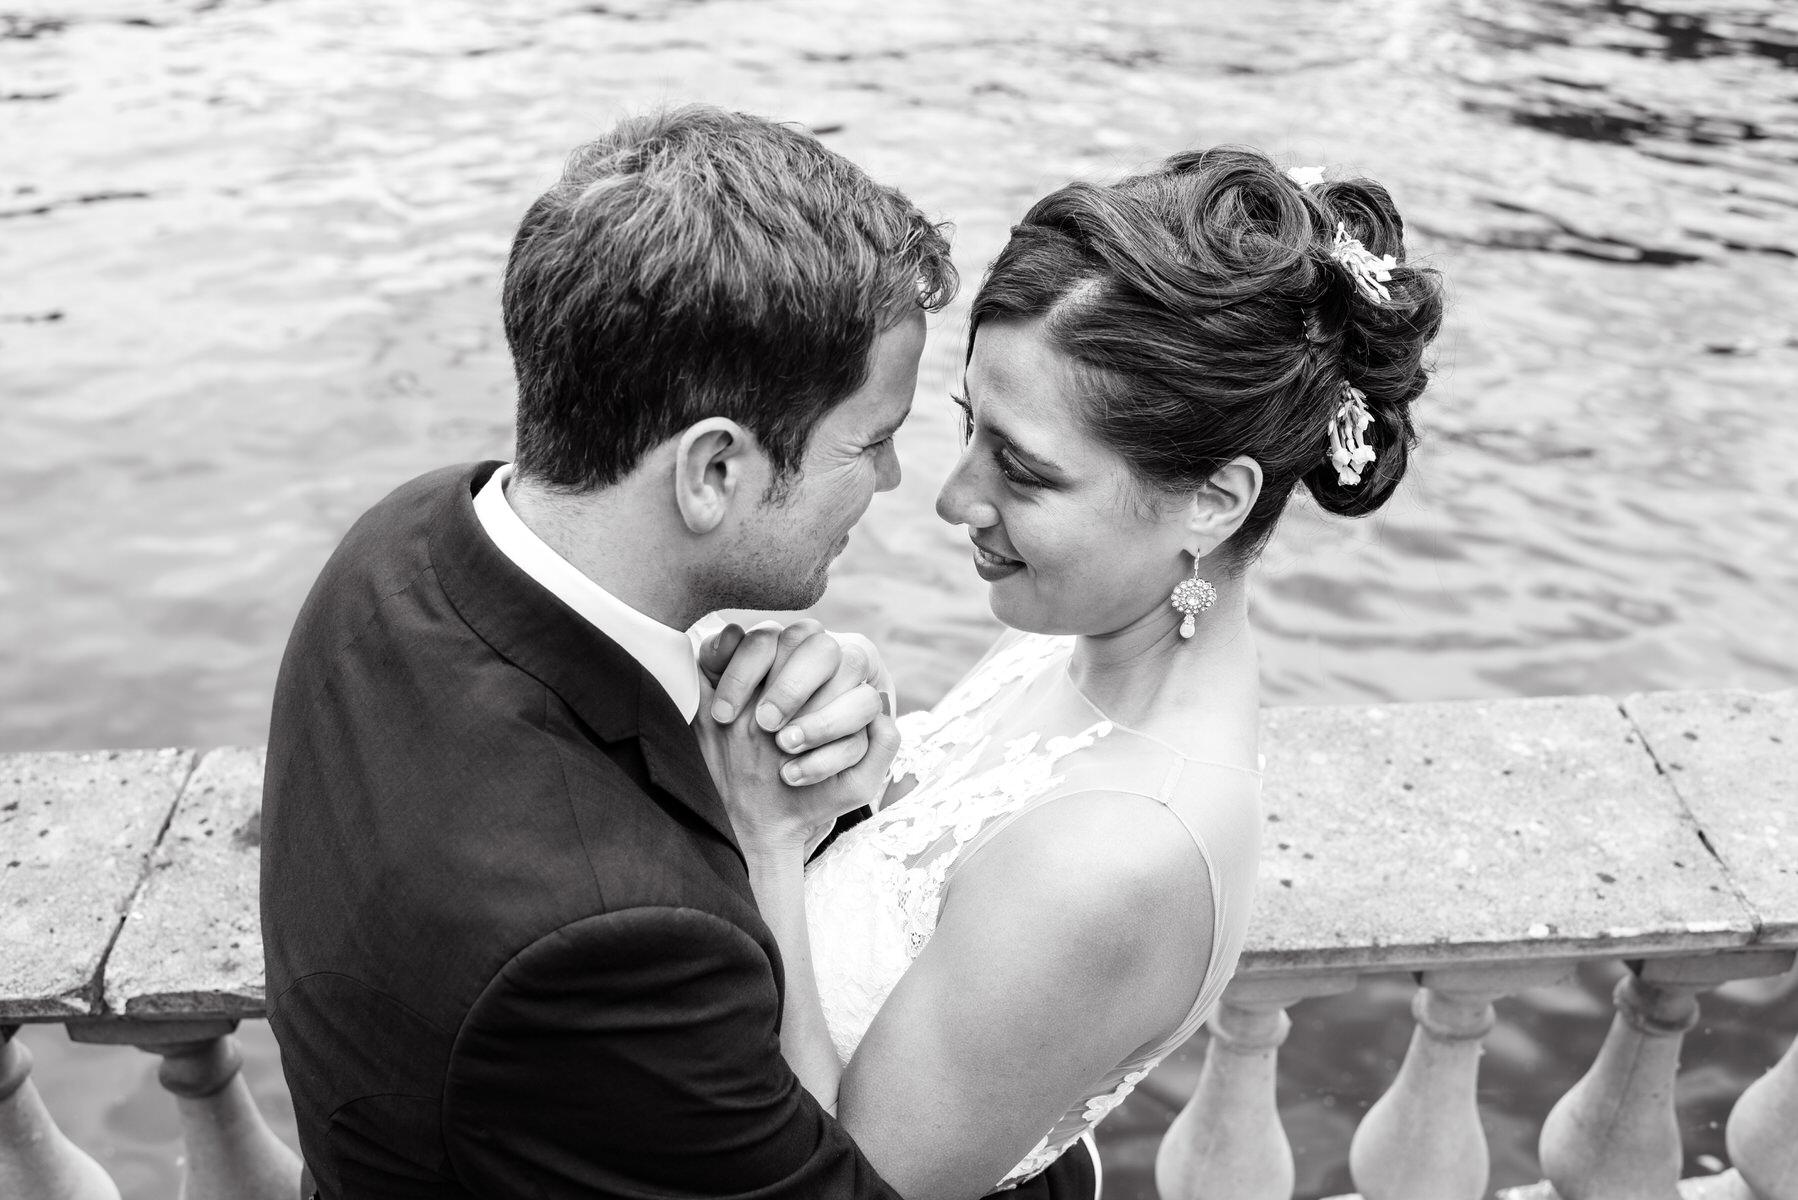 Ravens Ait wedding bride and groom